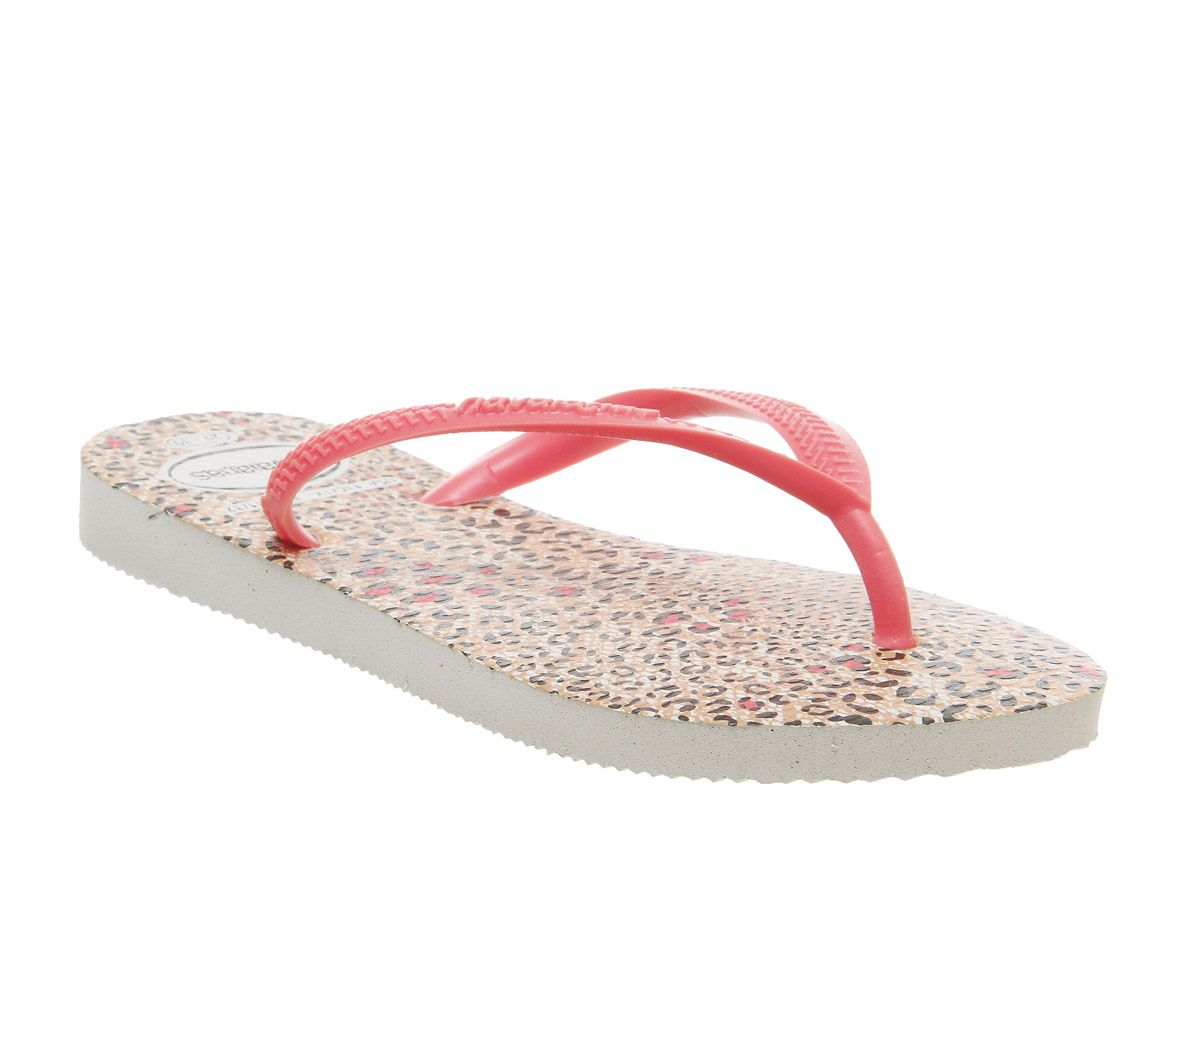 a7ec8bcaf10cb Havaianas Slim Fashion Kids Flip Flops Coral Leopard - Unisex